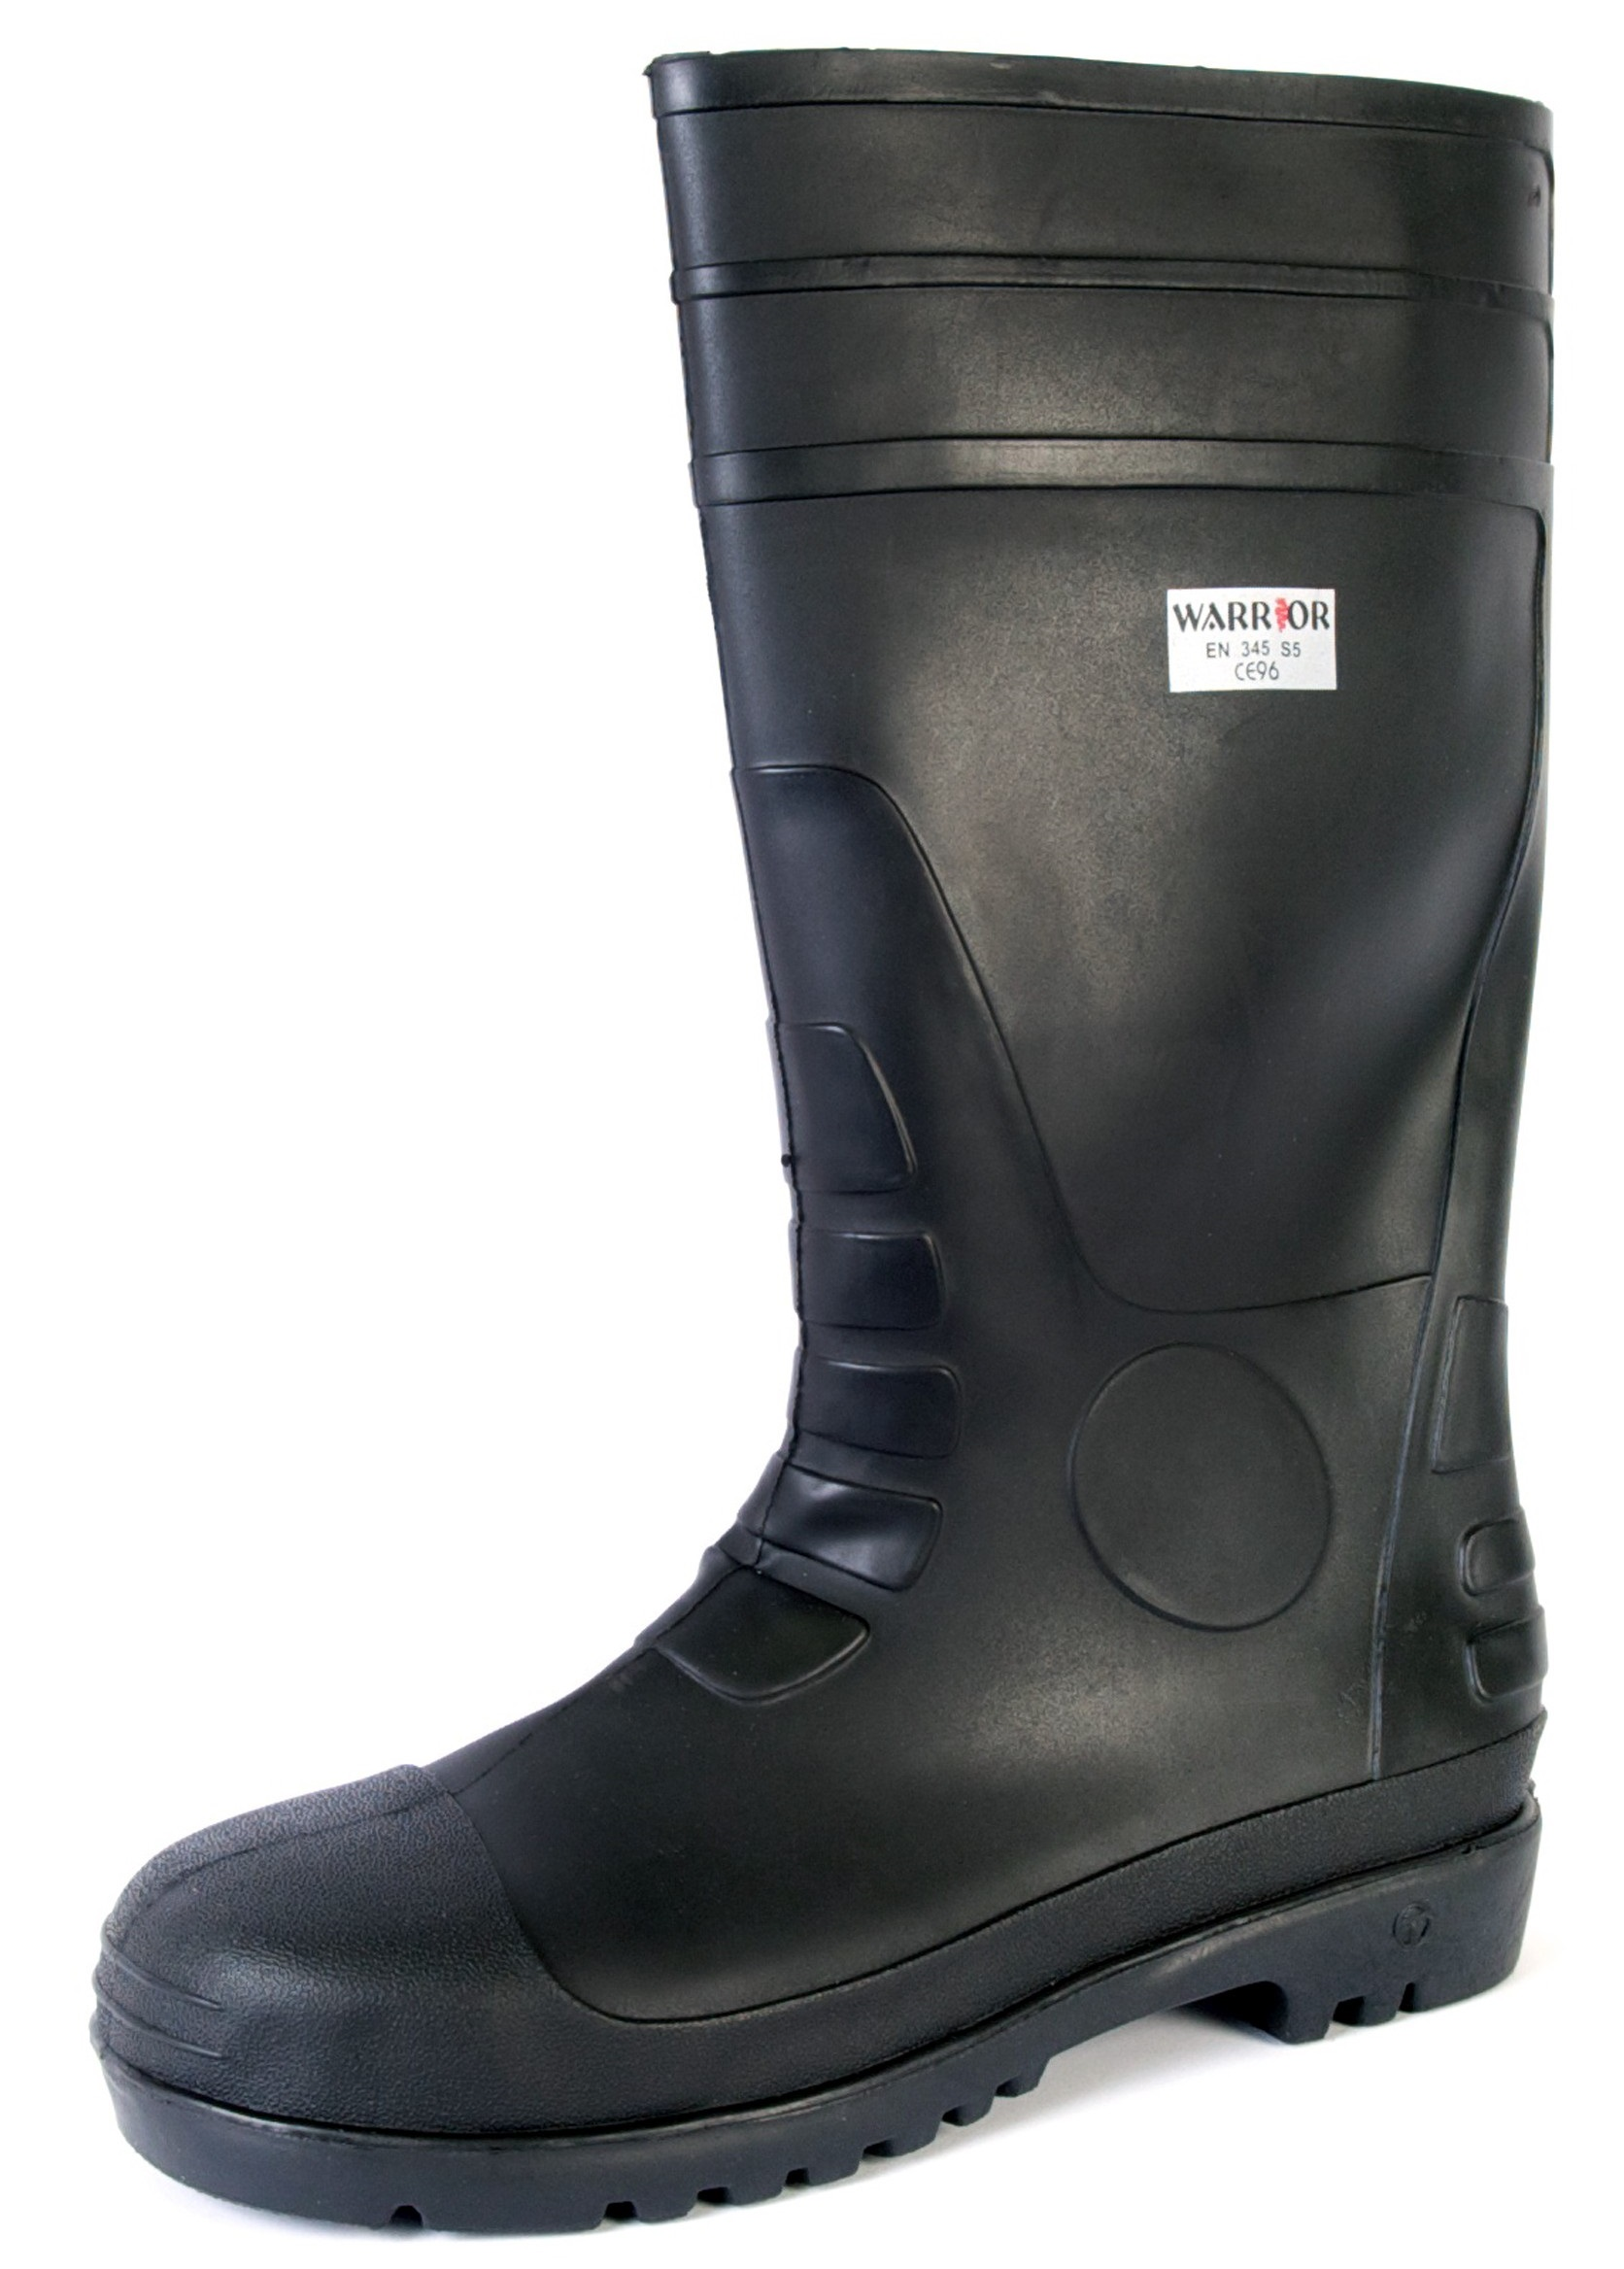 Black Safety Wellington Boot